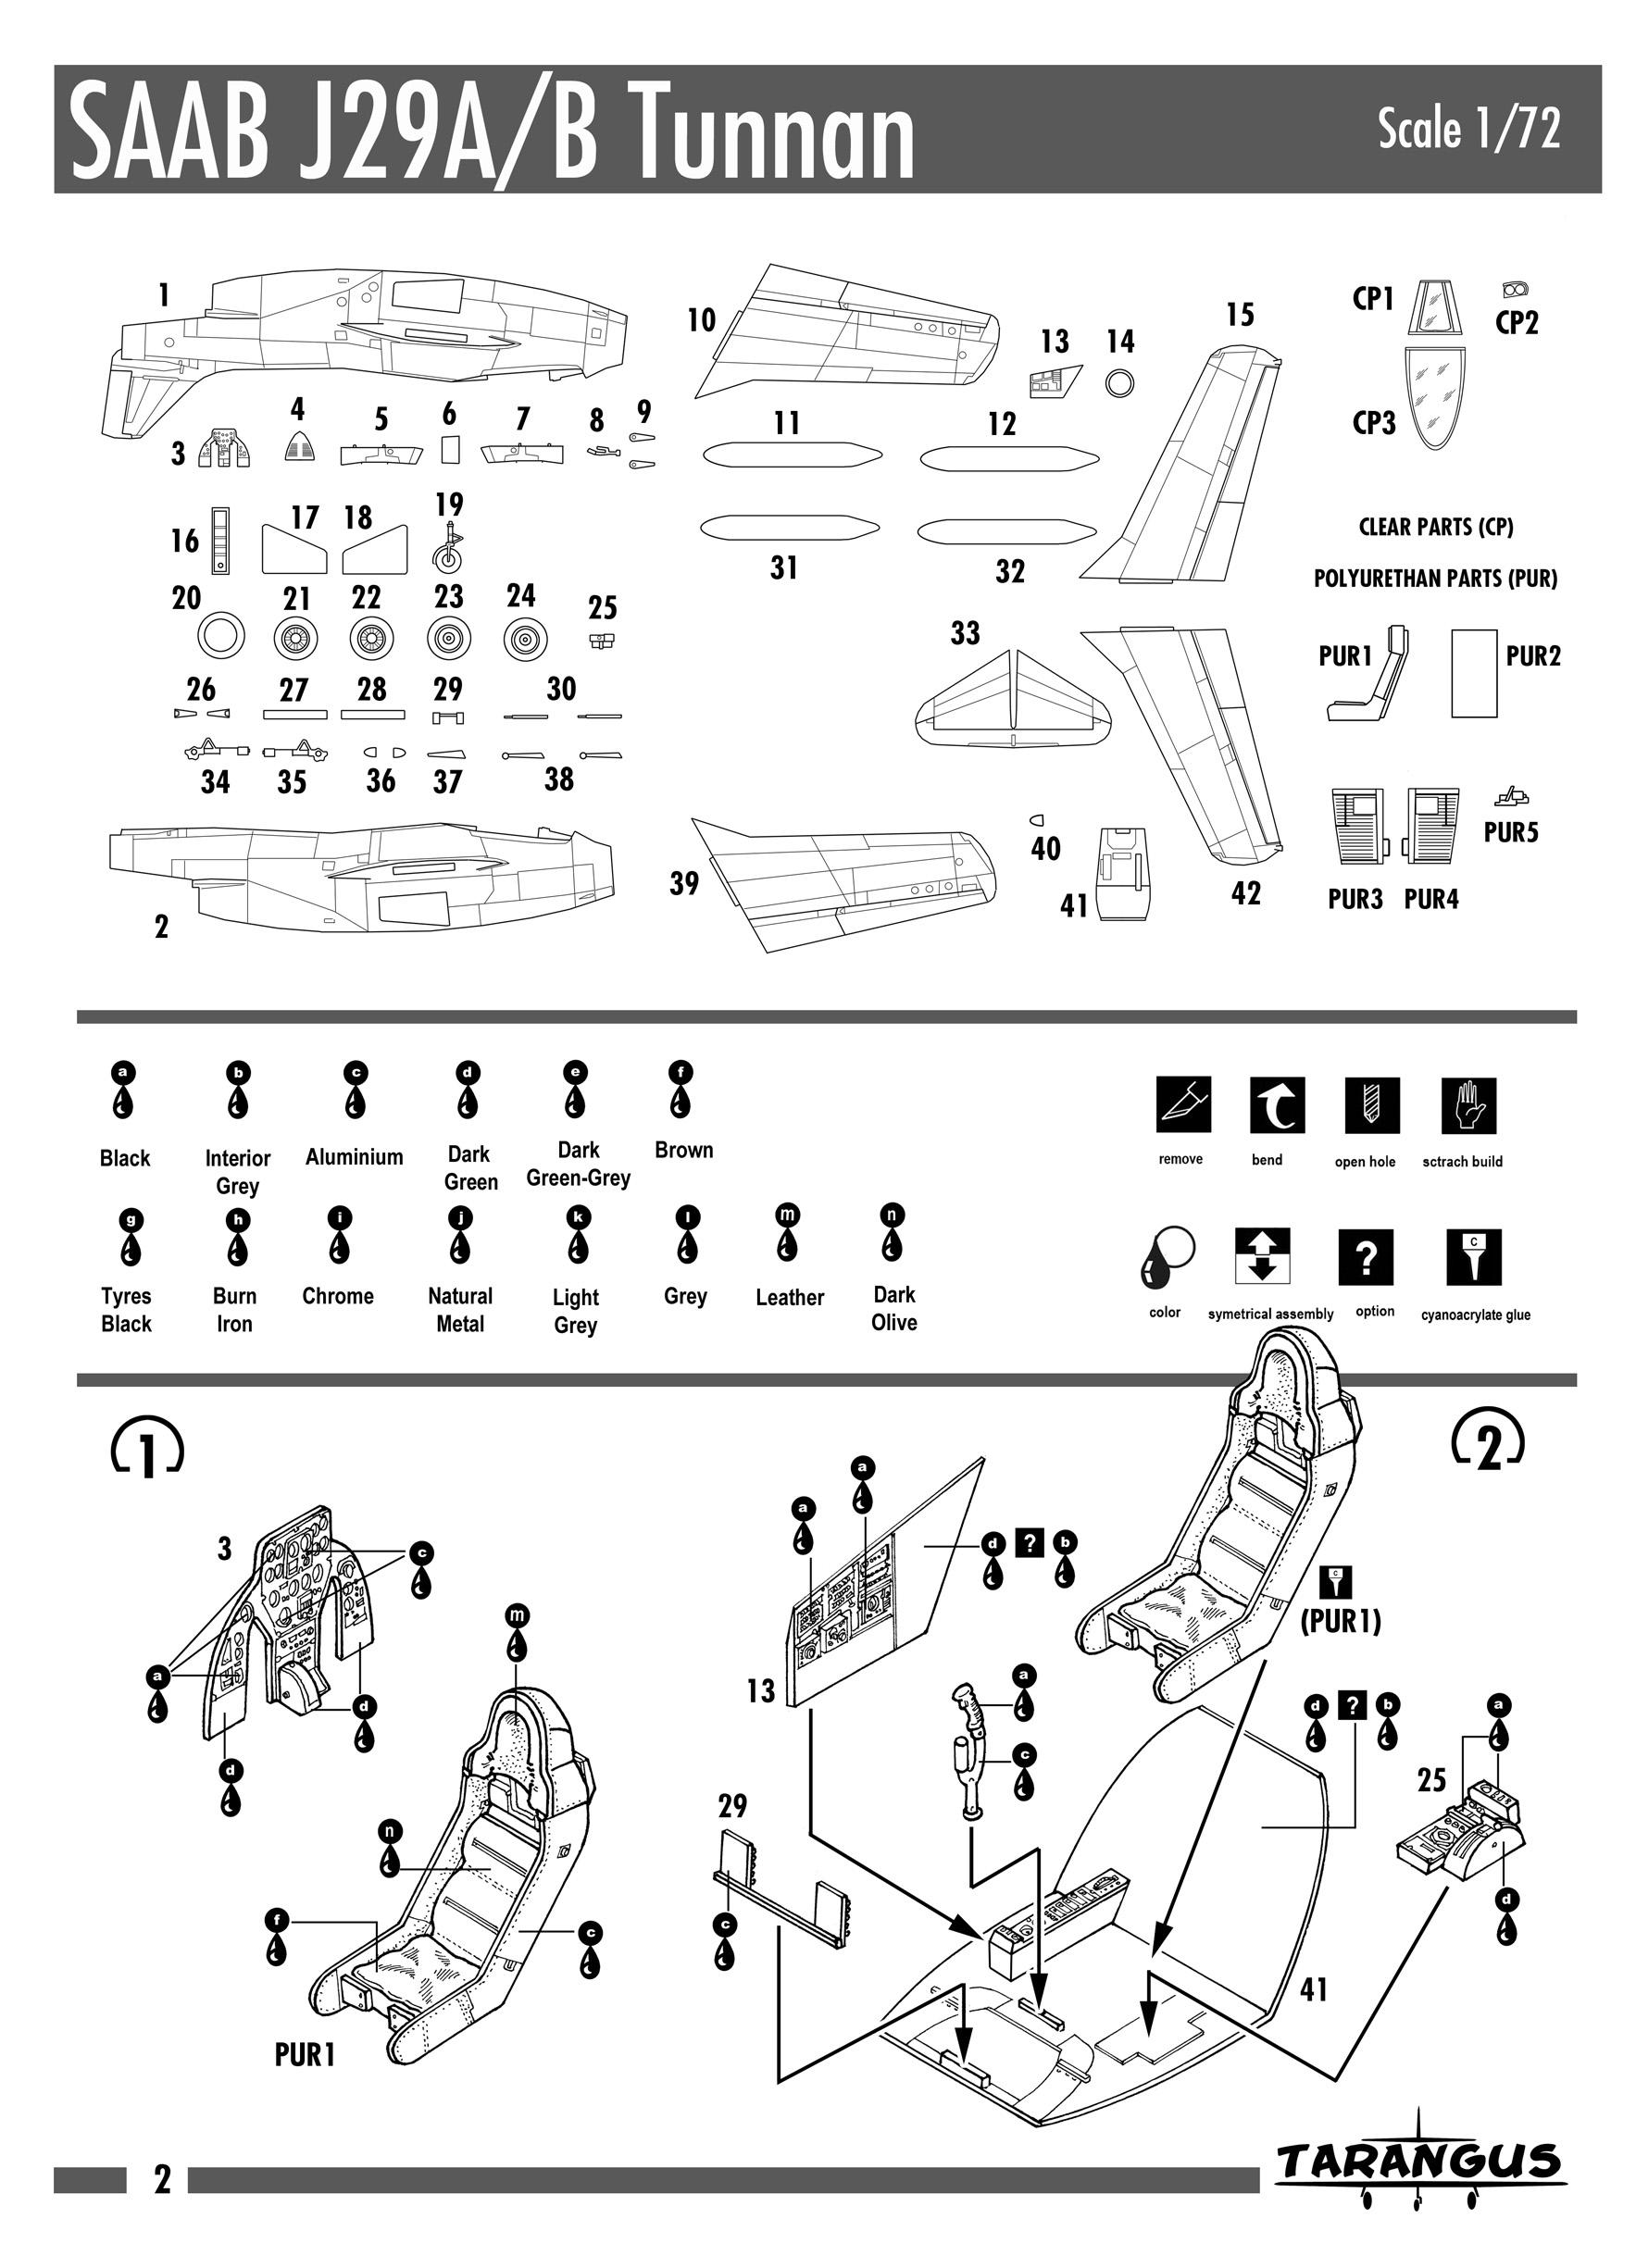 TA7201_page2